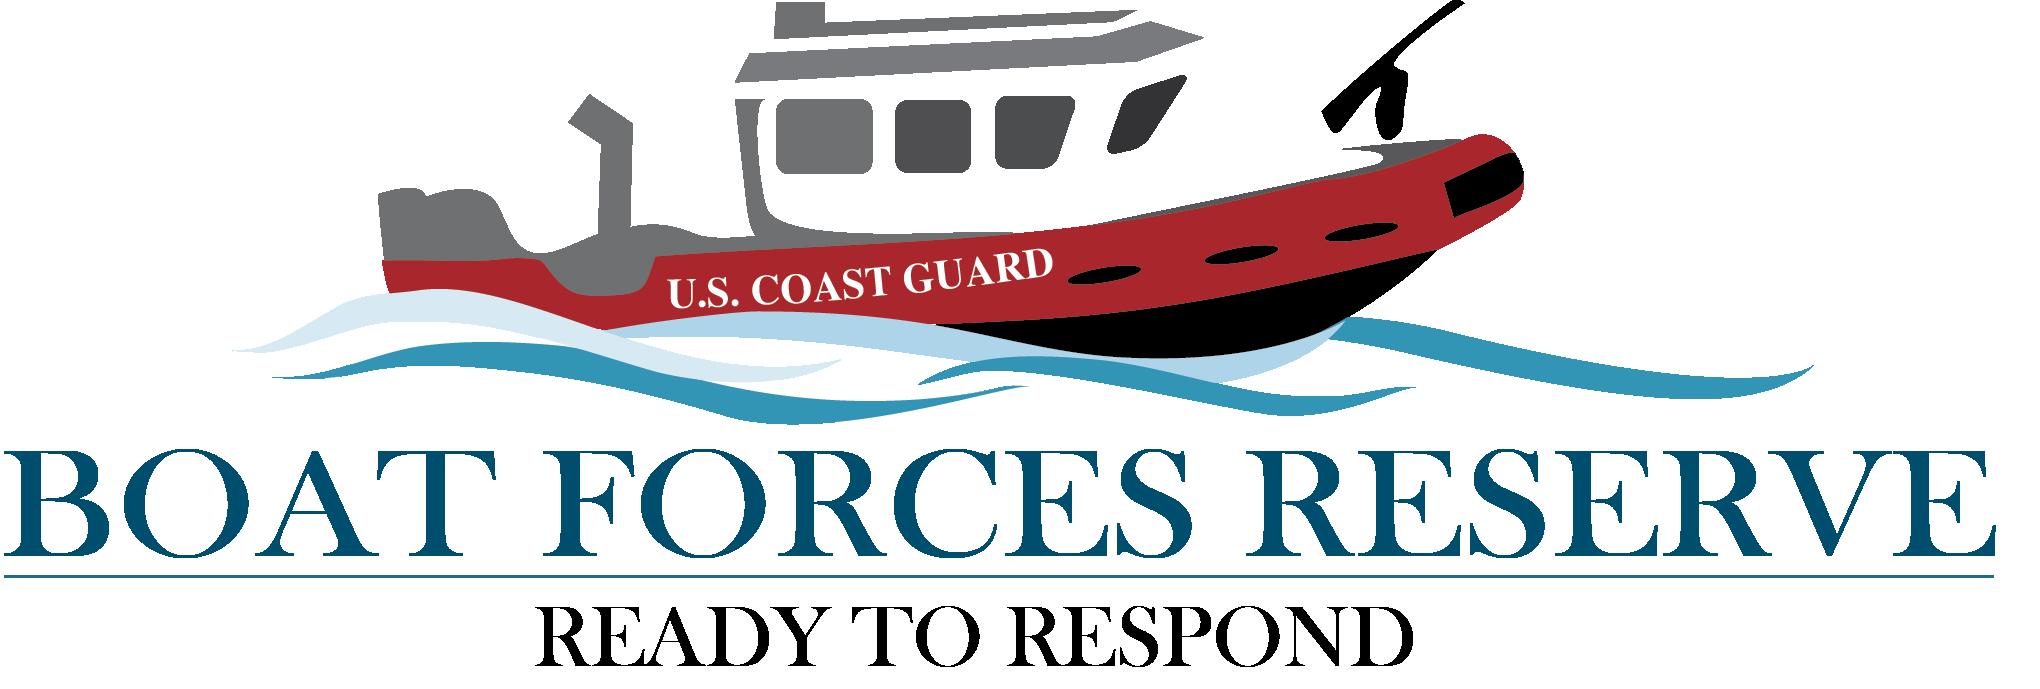 Navy clipart bravo zulu. Boat forces reserve logo